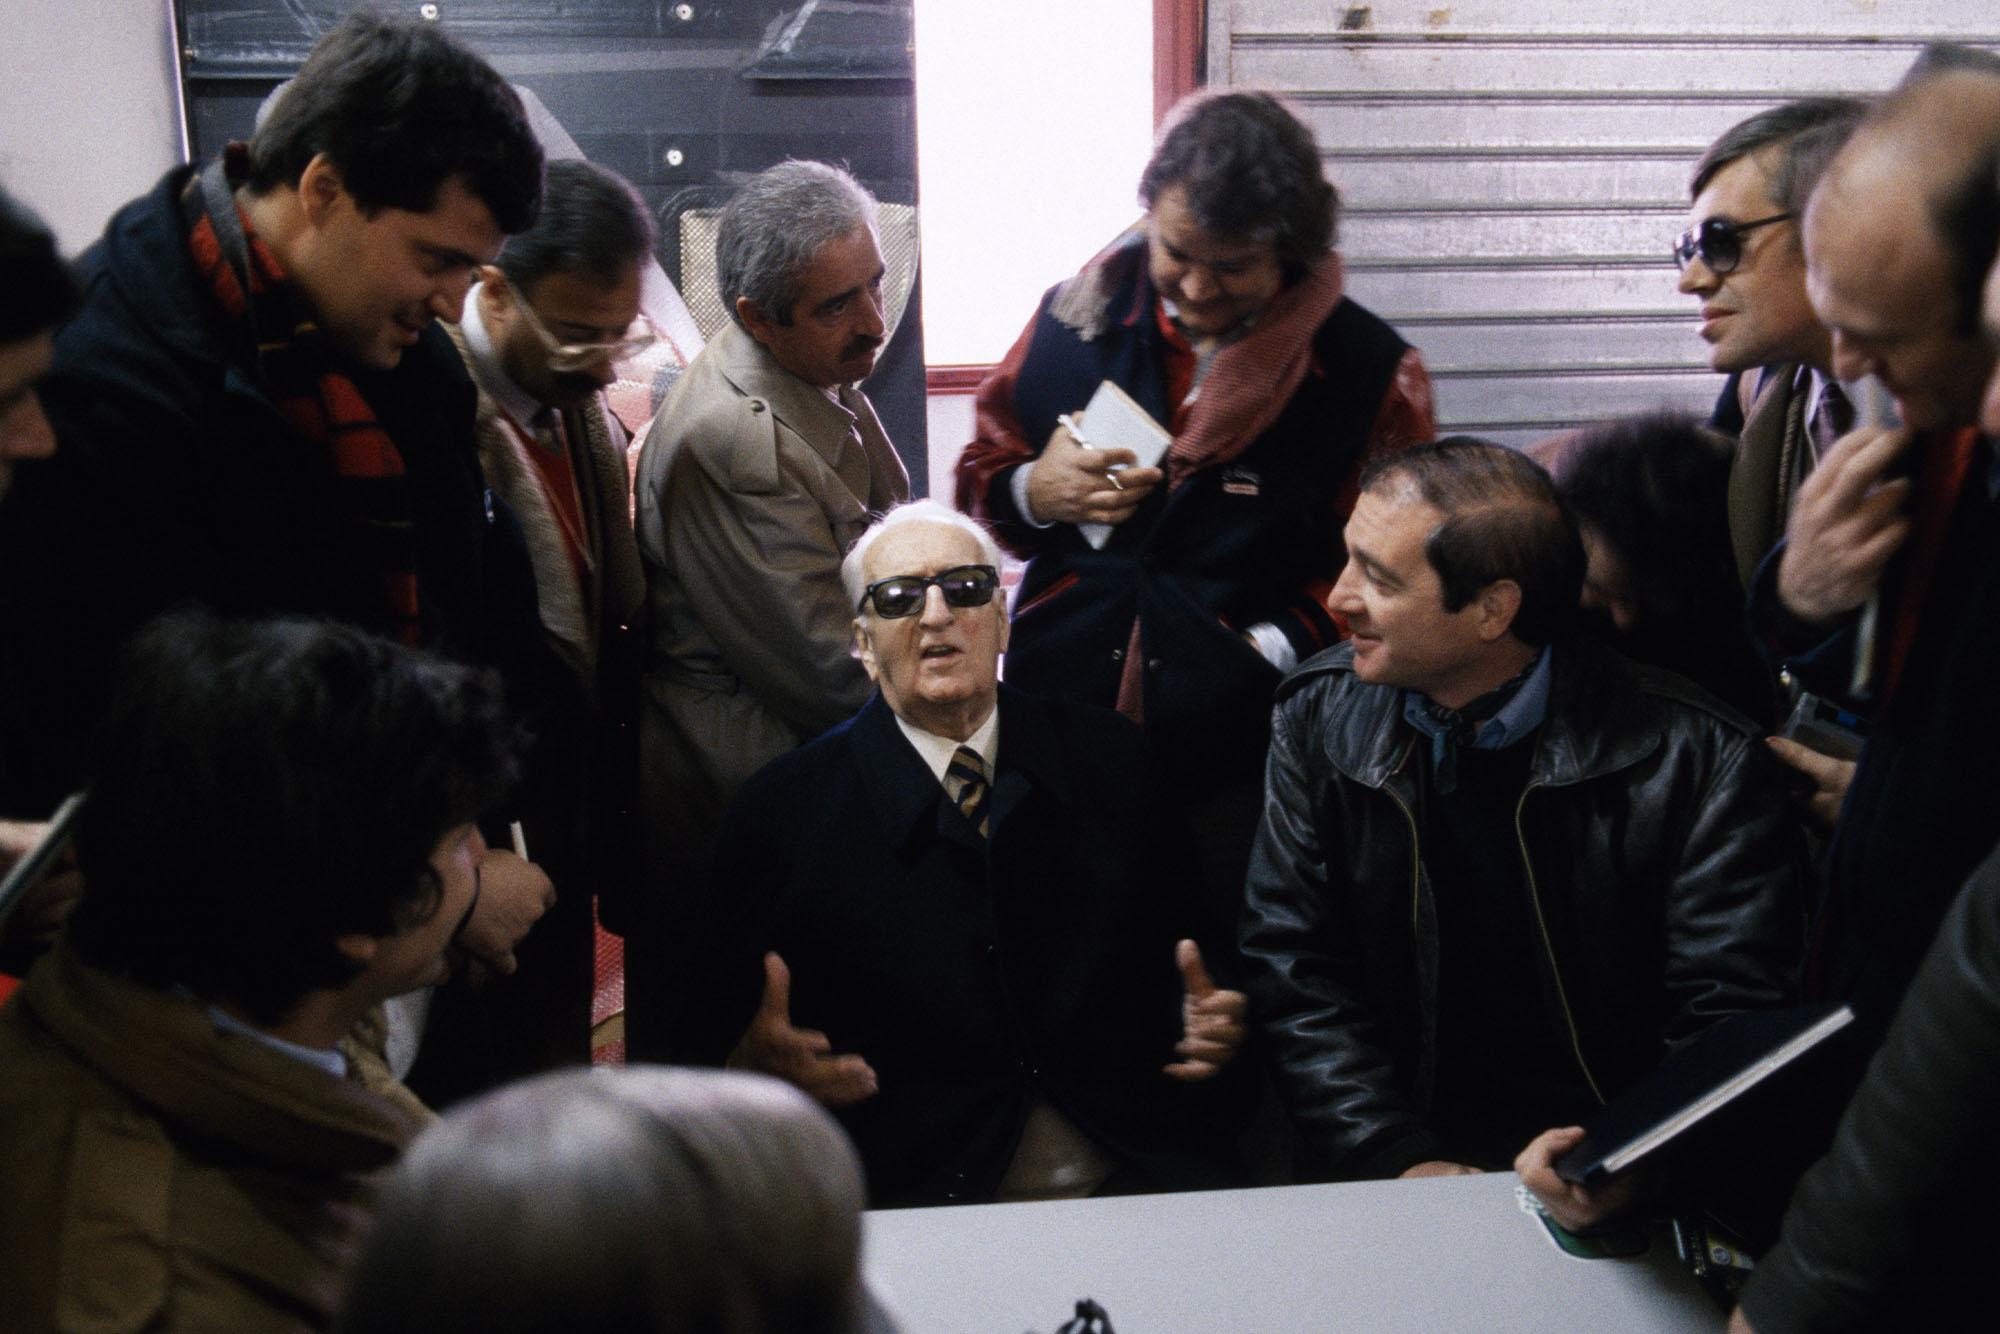 Le fondateur de Ferrari, Enzo Ferrari, à Imola le 20 mars 1985, Italie. (Photo by Gianni GIANSANTI/Gamma-Rapho via Getty Images)